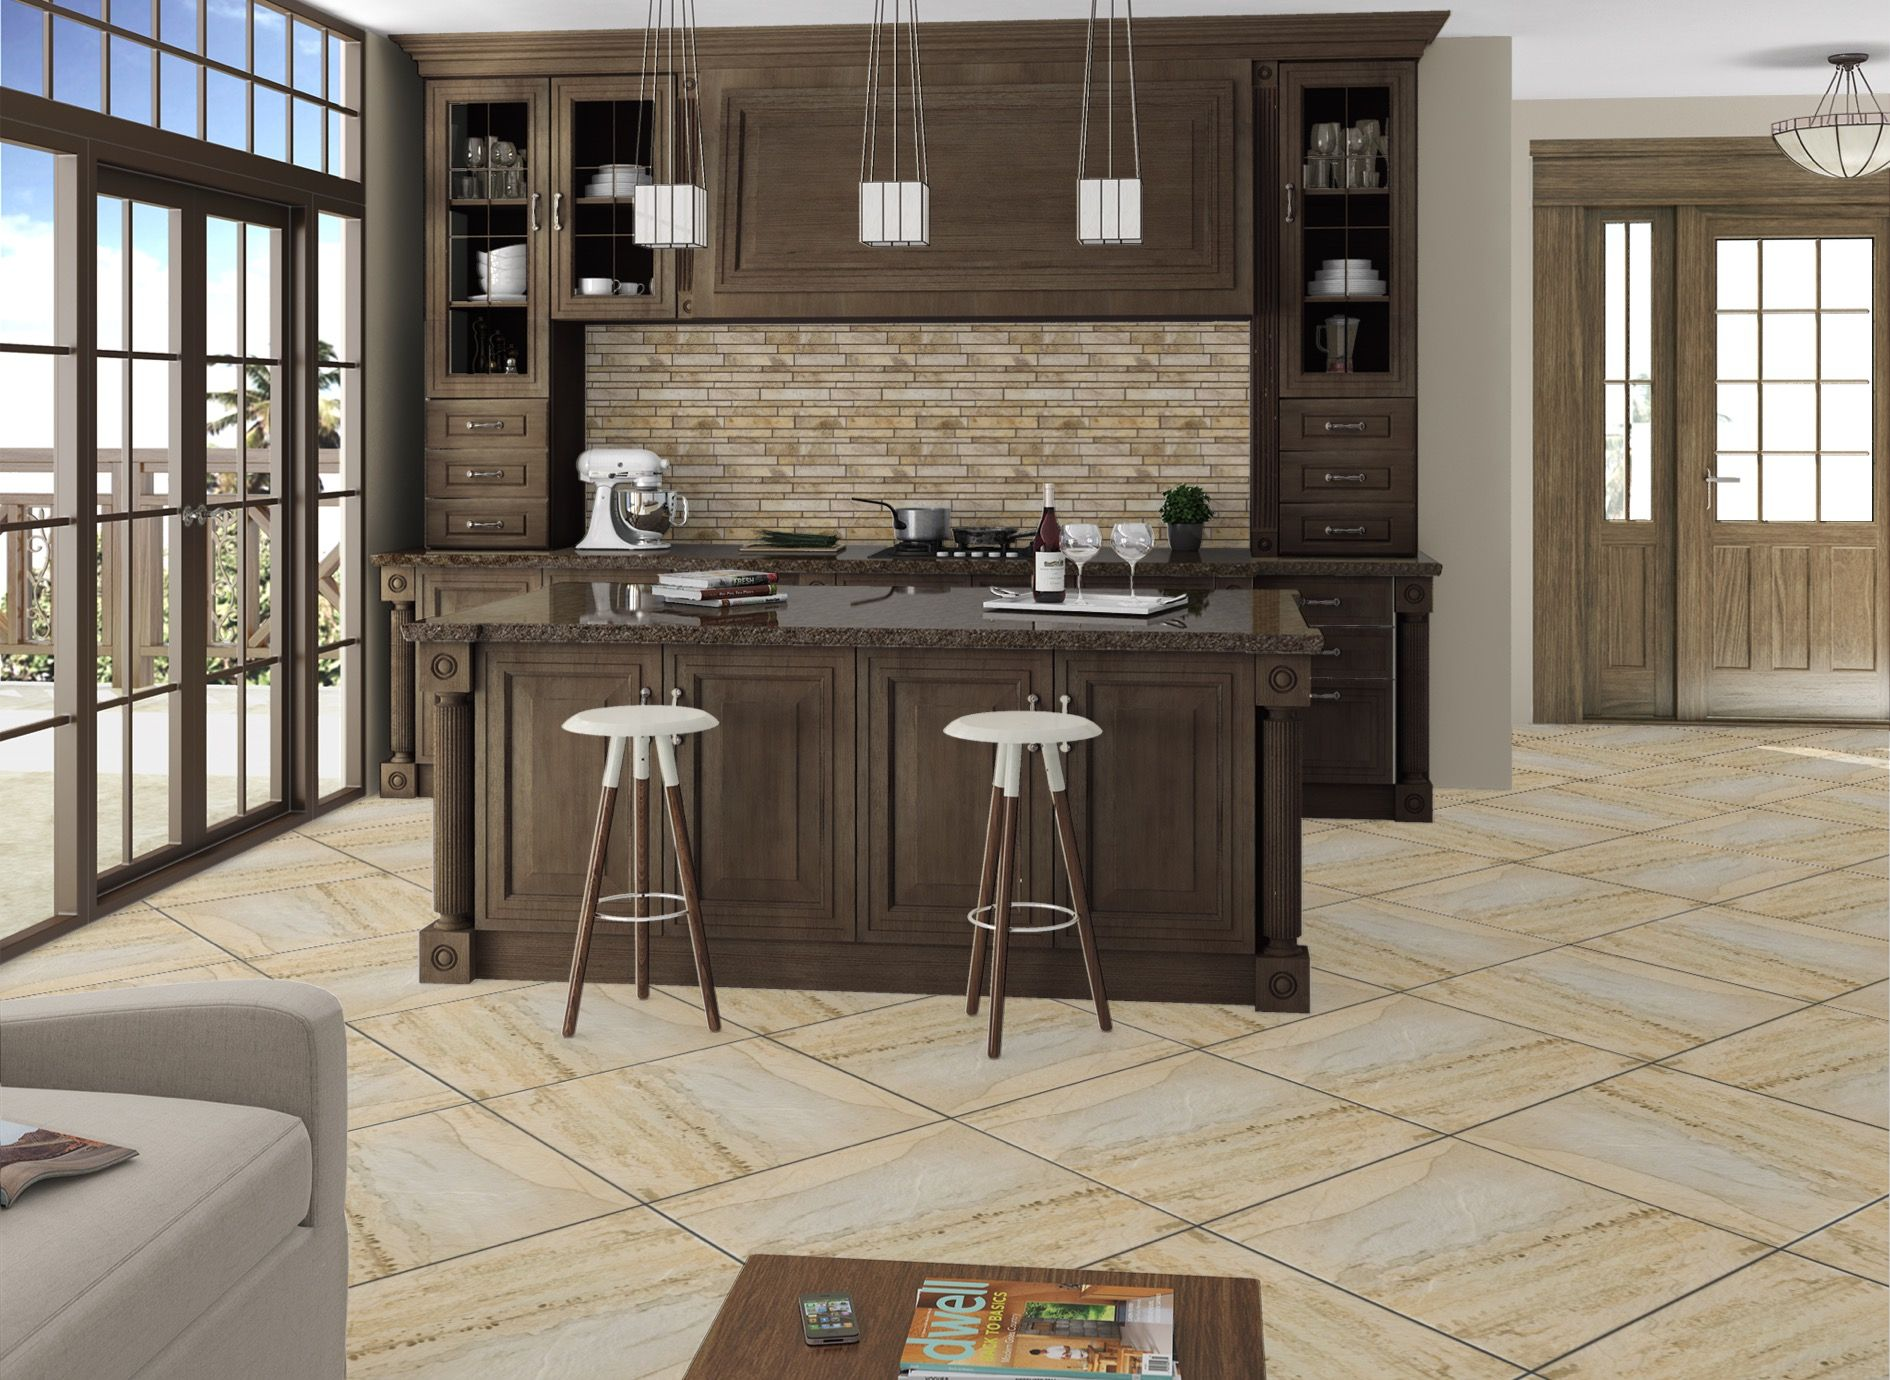 Calabria Linear Mosaic Kitchen Backsplash designed using